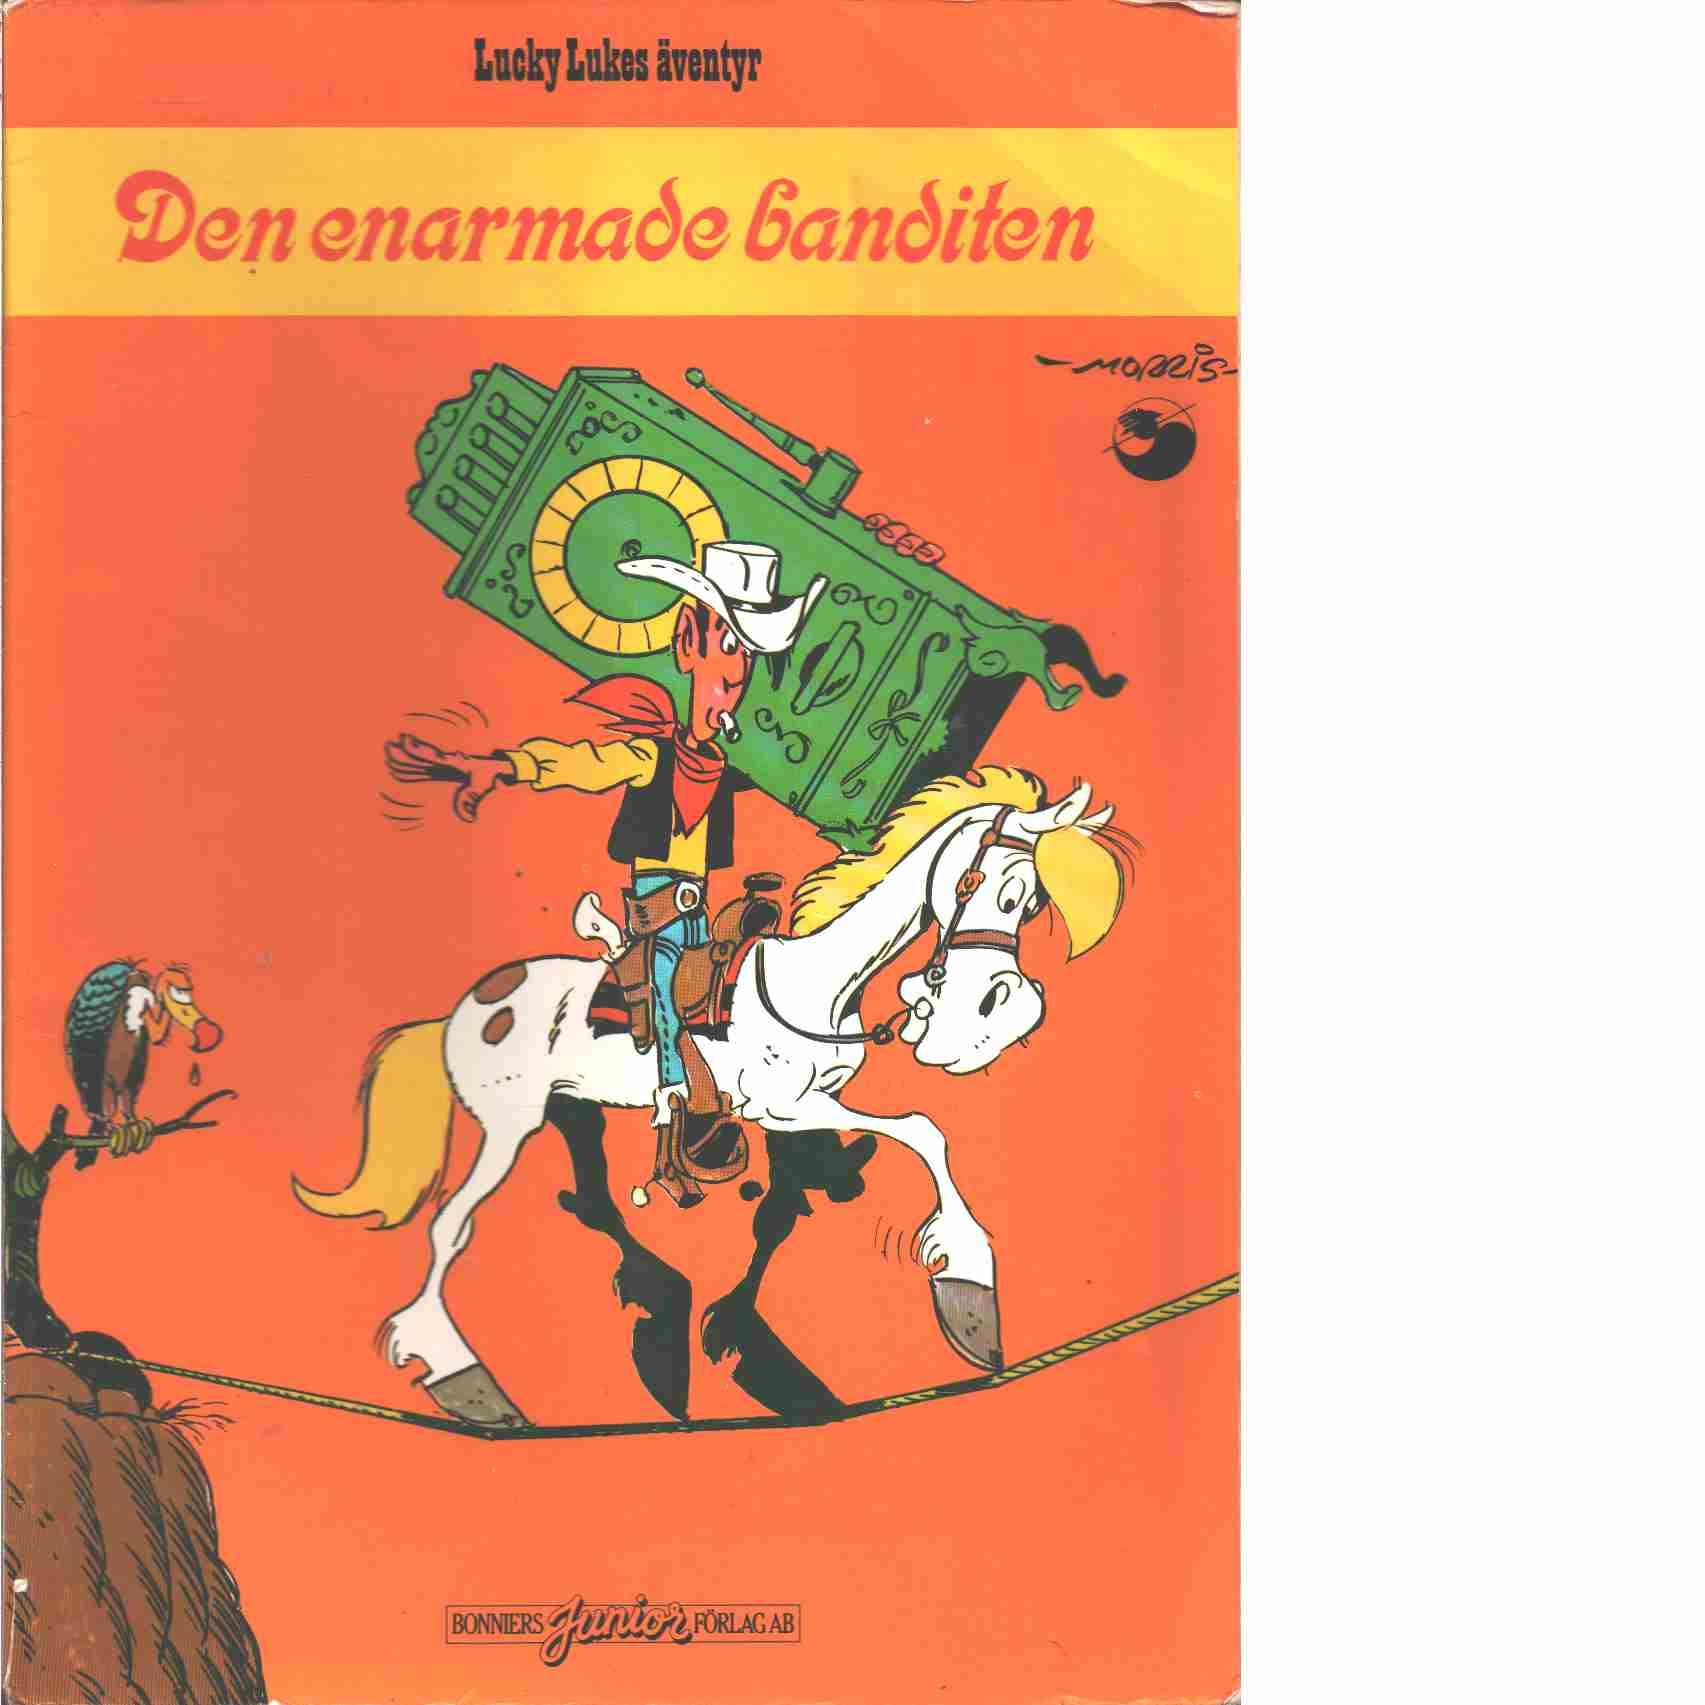 Lucky Lukes äventyr 44 : Den enarmade banditen  - Morris